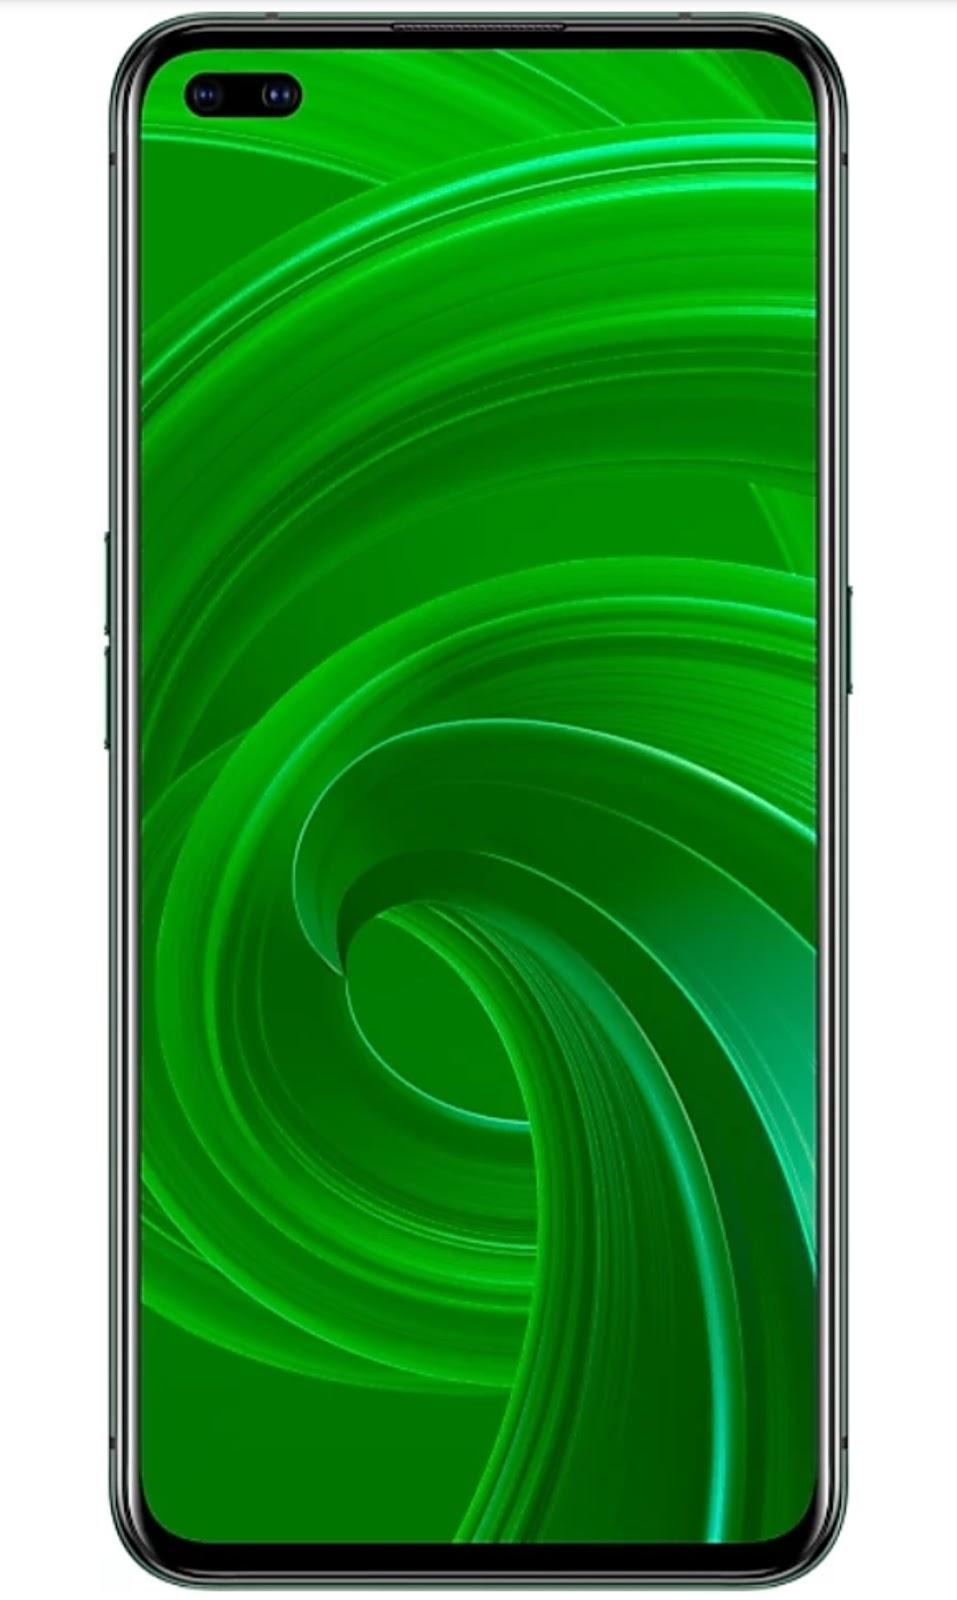 realme x50 pro 5g price in india flipkart, realme x50 pro launch